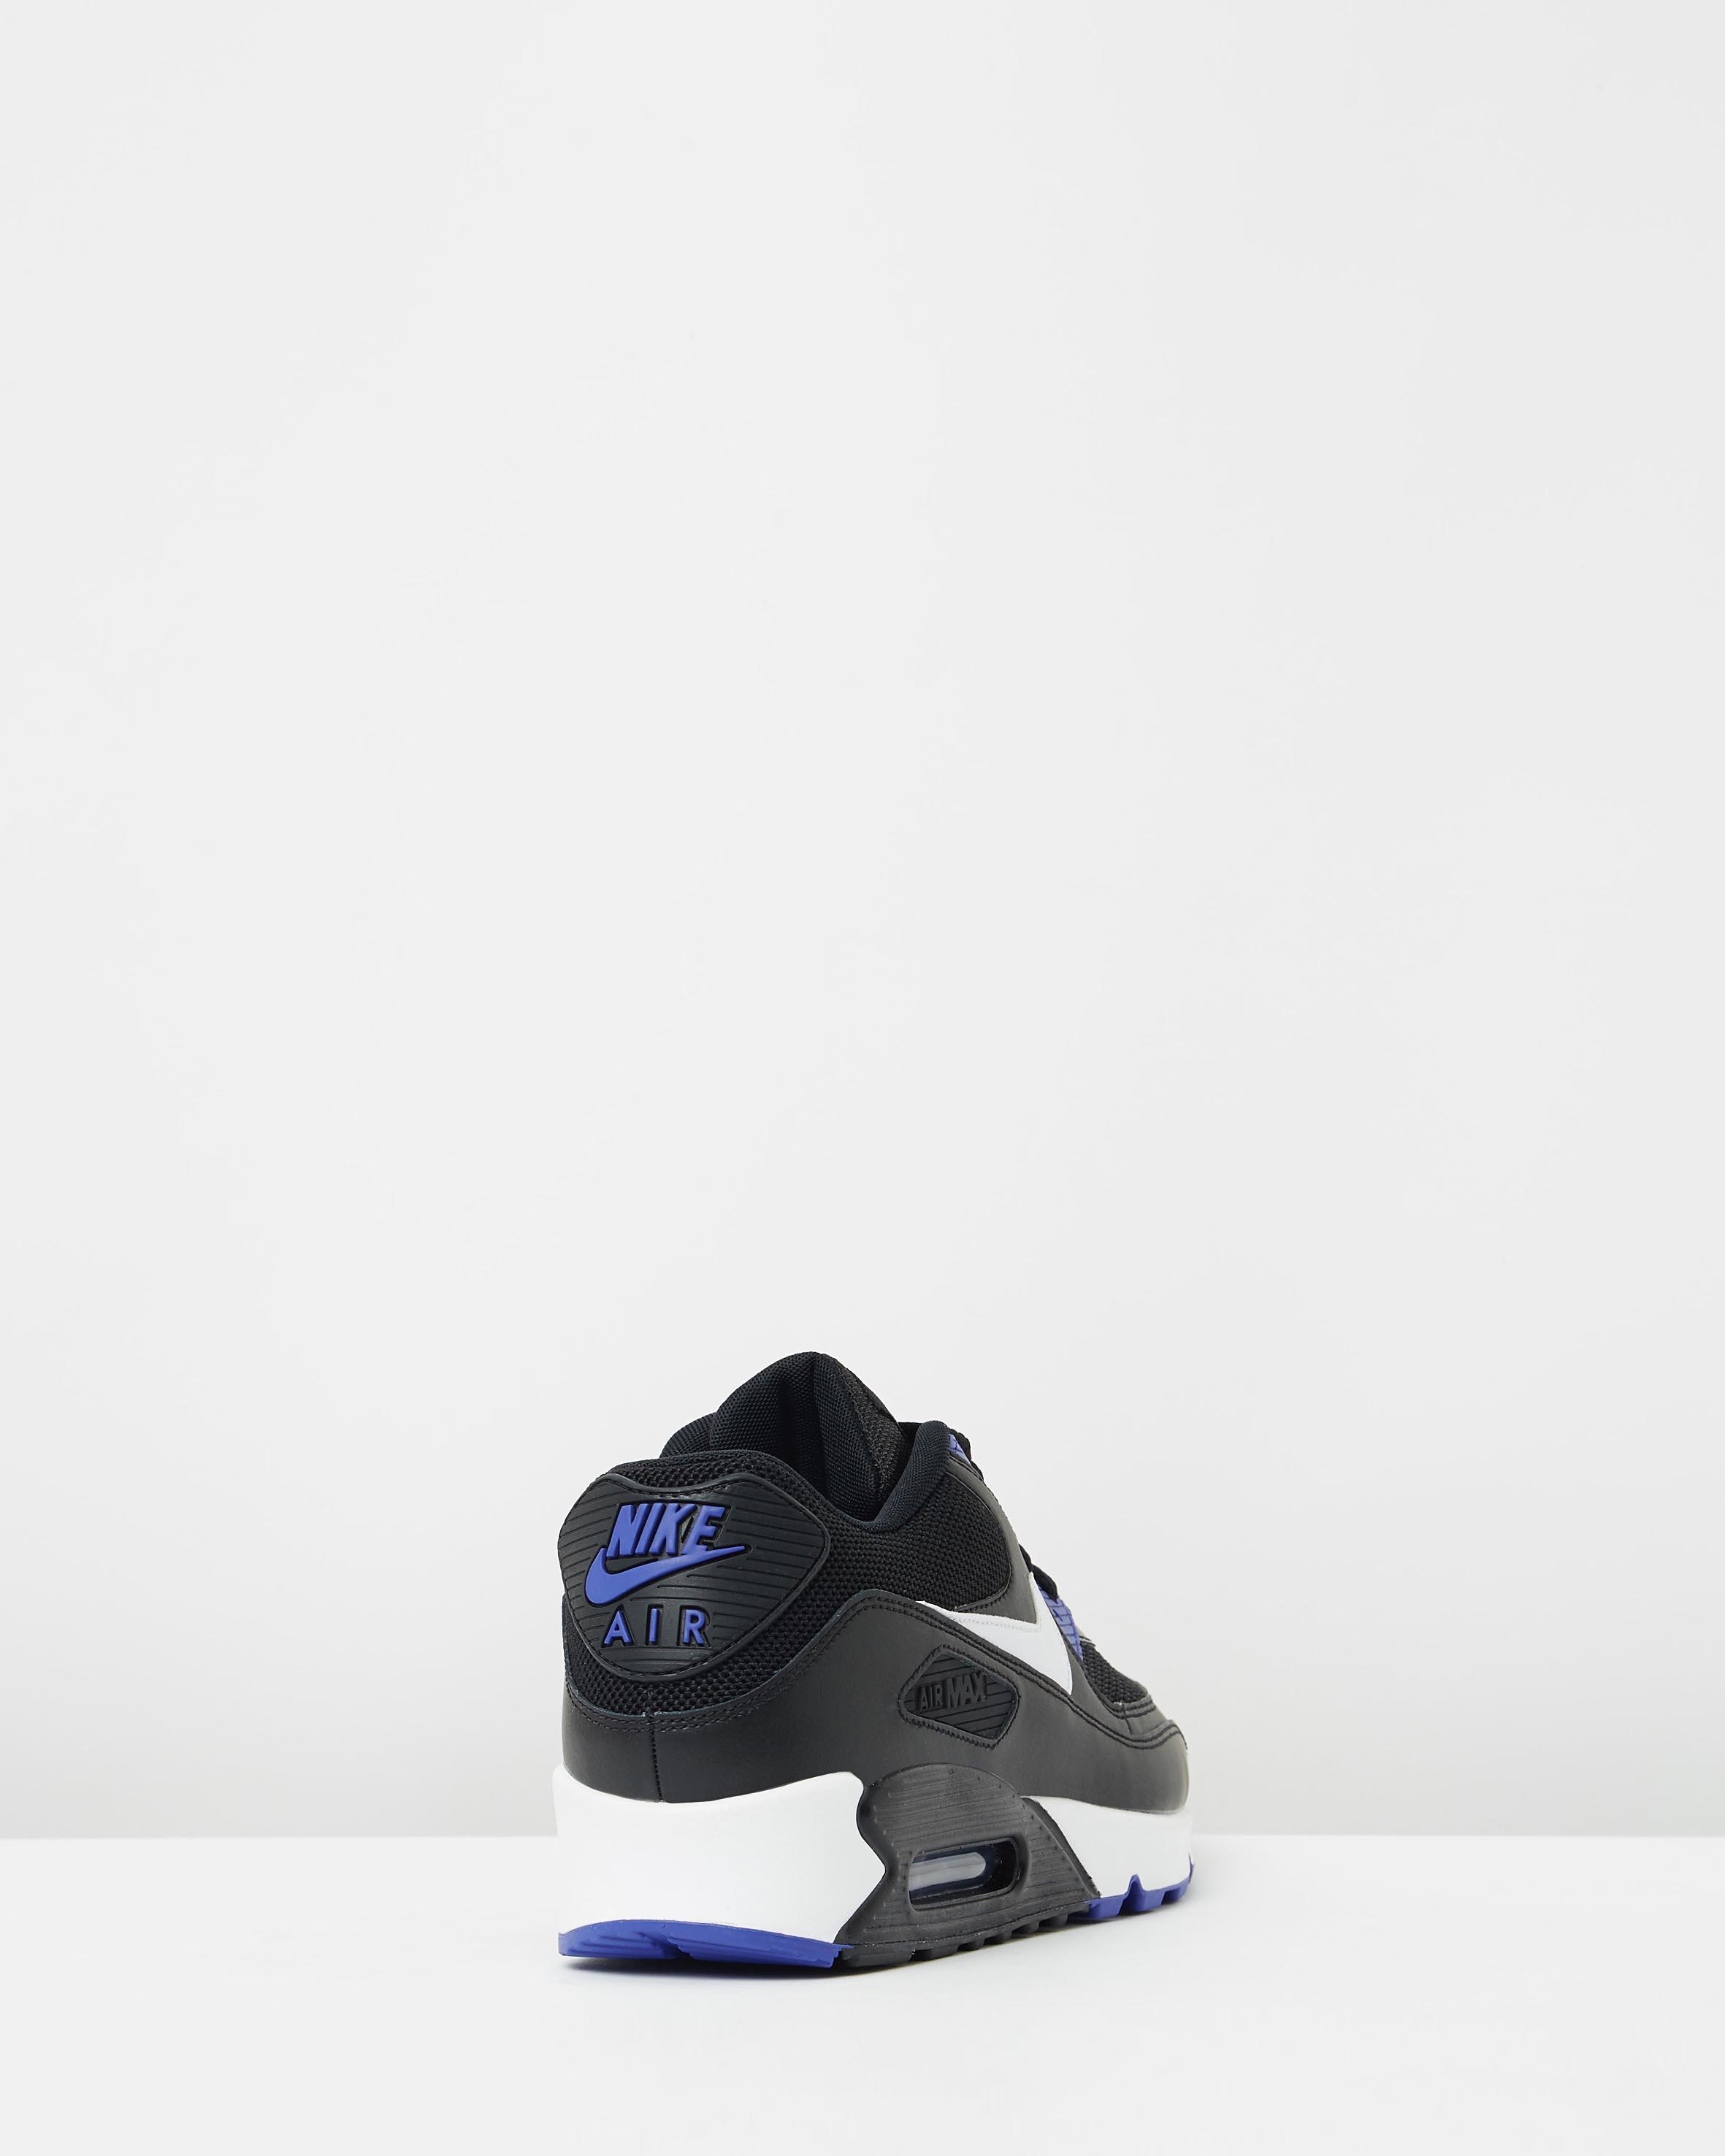 9e67d39435ae69 ... Nike Air Max 90 Essential Black White Persian Violet 2 ...